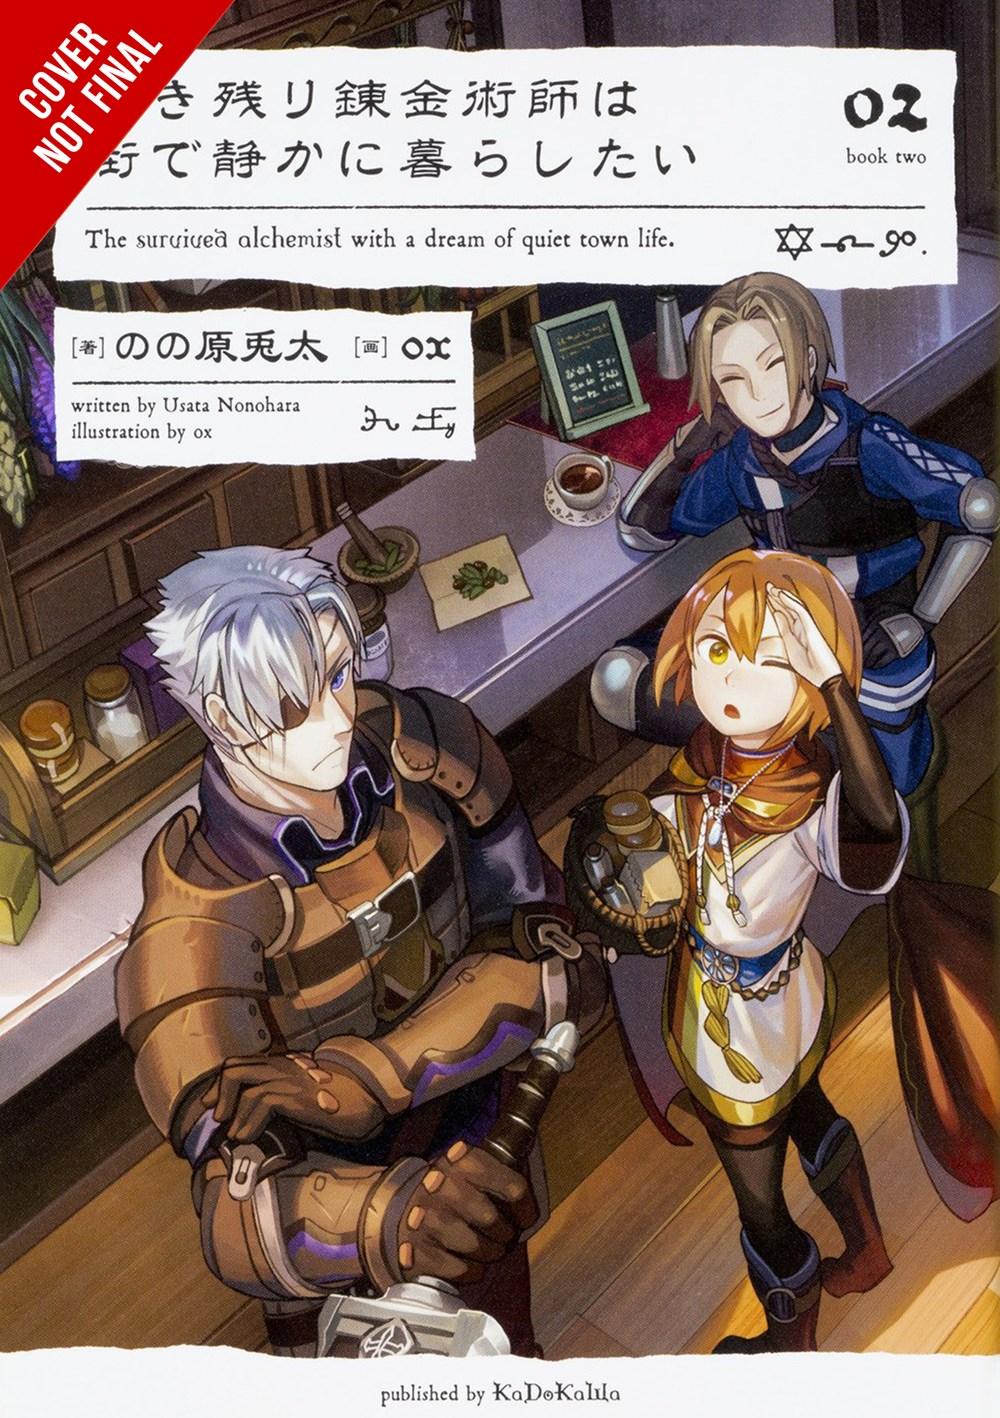 The Alchemist Who Survived Now Dreams Novel Volume 2